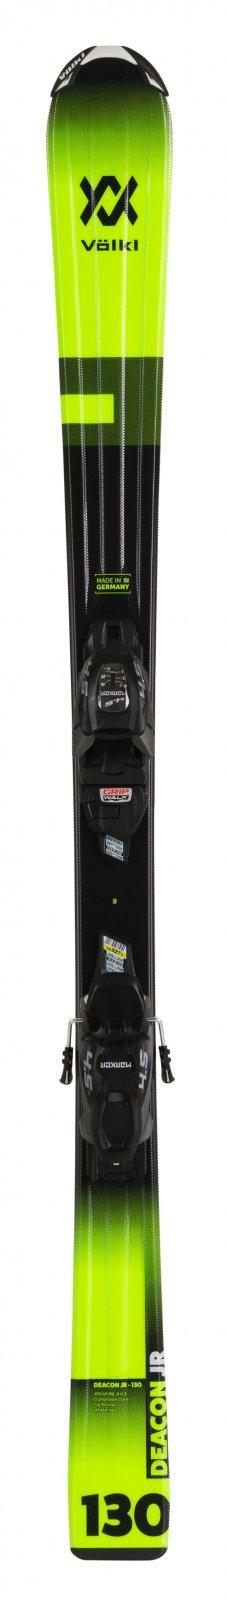 Volkl Deacon JR VMotion + 4.5 VMotion JR Skis 2020 - size 130cm